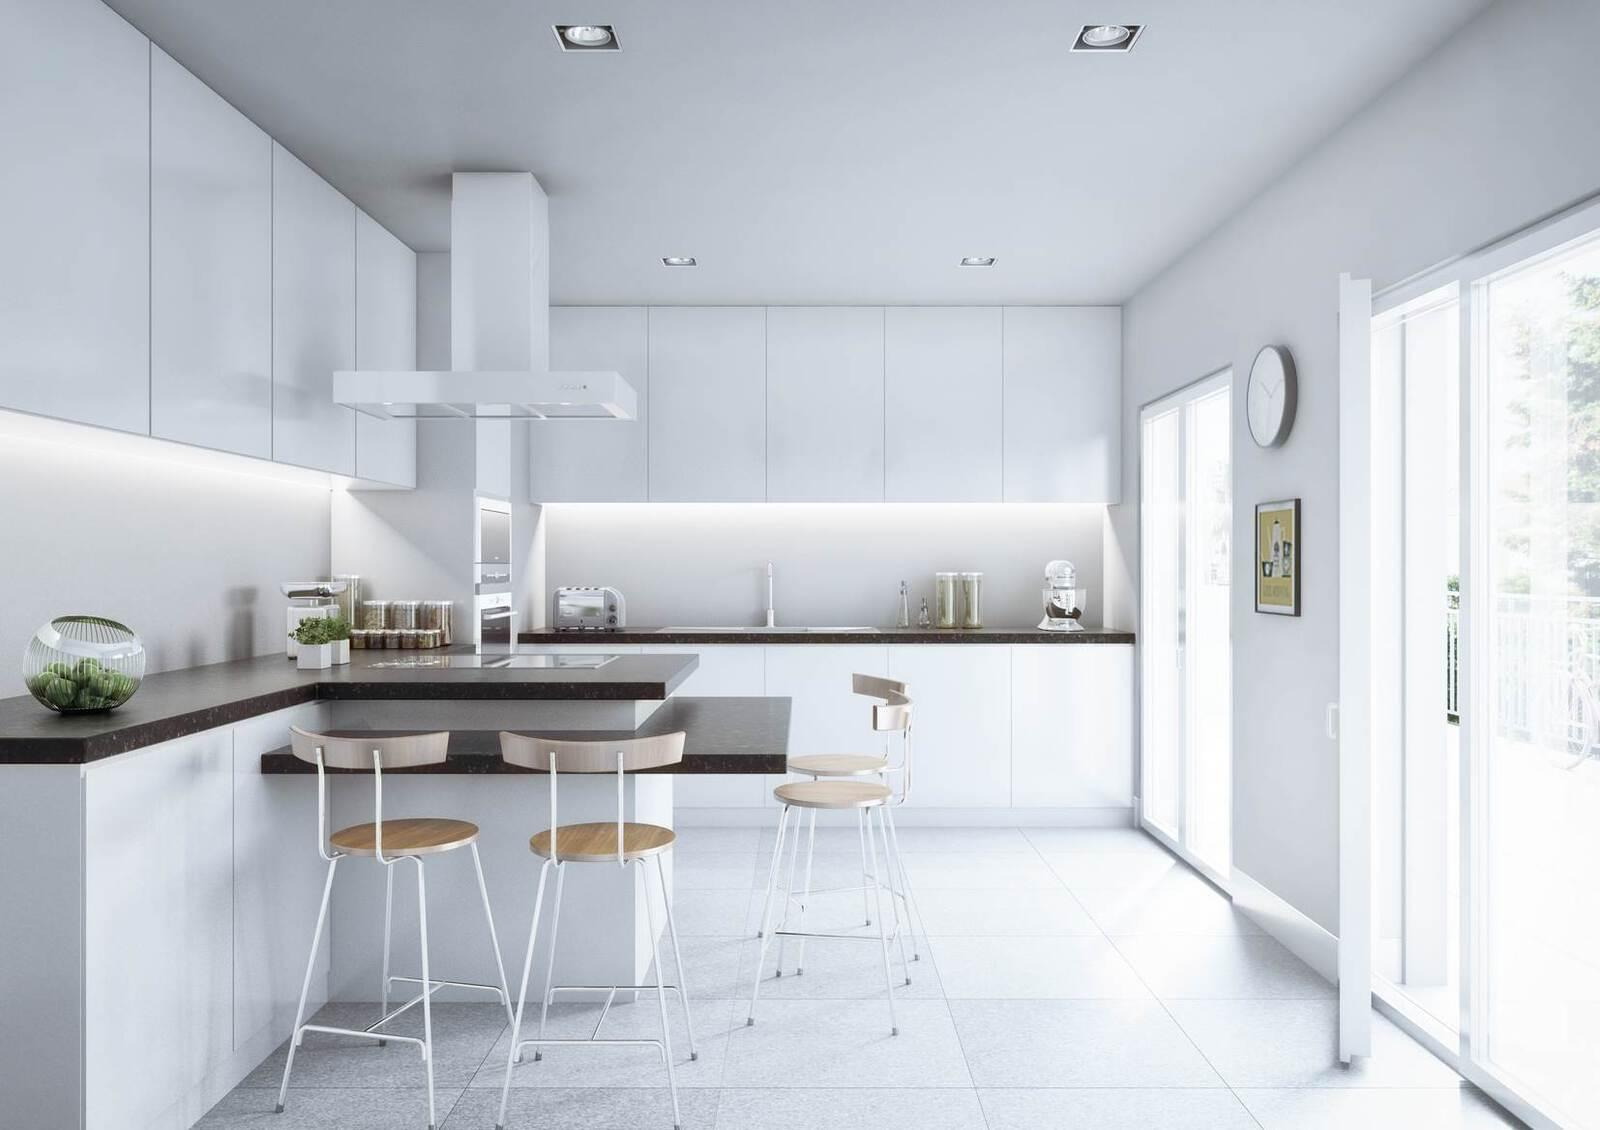 pf17095-apartamento-t3-cascais-a1f6b6d5-11a6-4a05-a20b-8e9ffe04c458